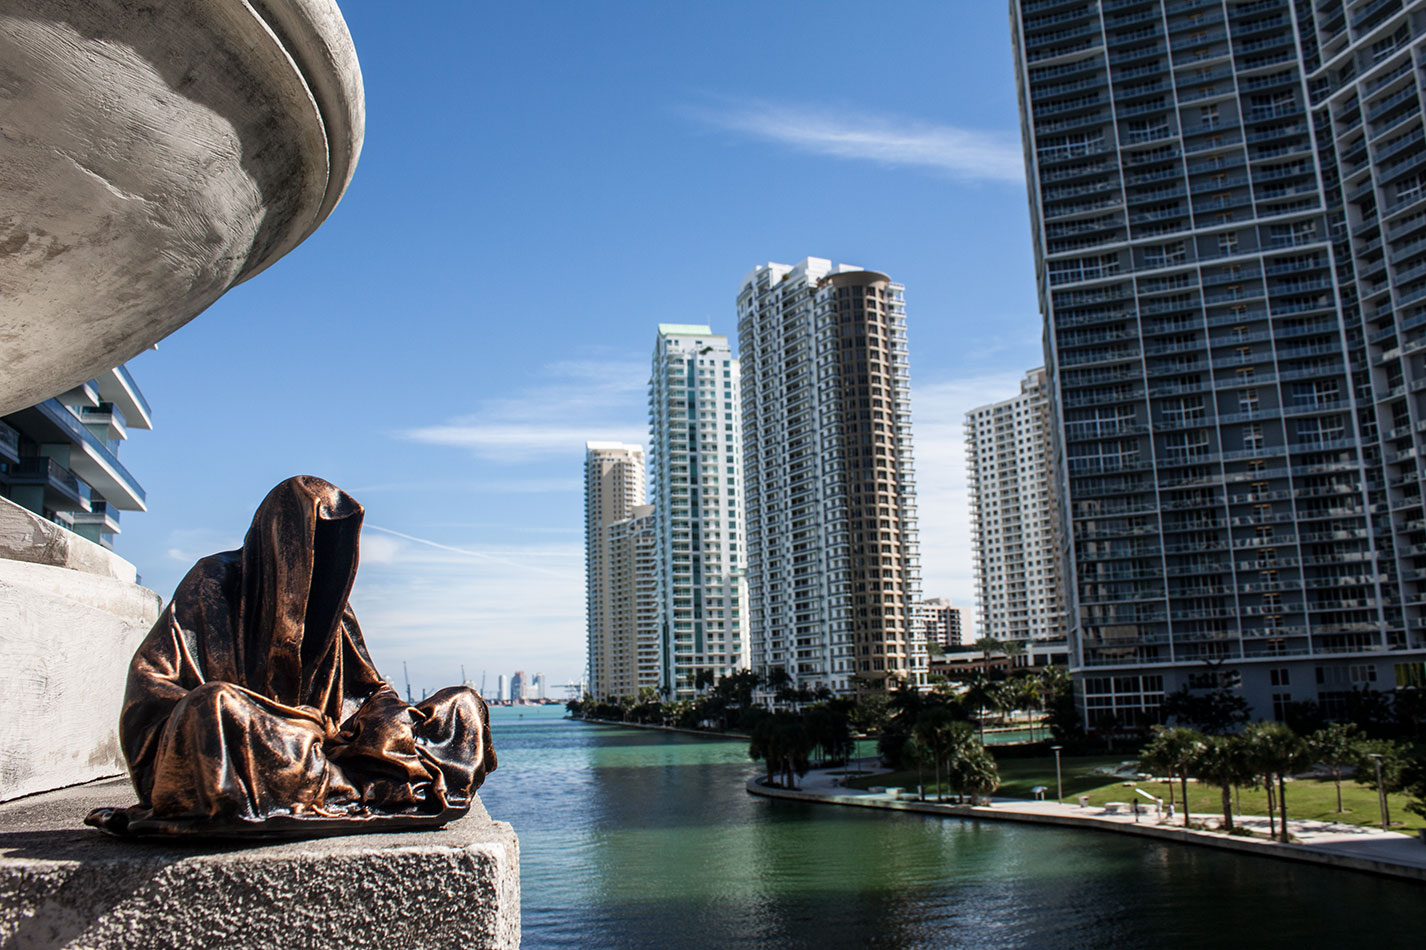 public-art-basel-miami-beach-fair-usa-florida-guardians-of-time-manfred-kili-kielnhofer-contemporary-fine-art-modern-arts-design-antiques-sculpture-6728